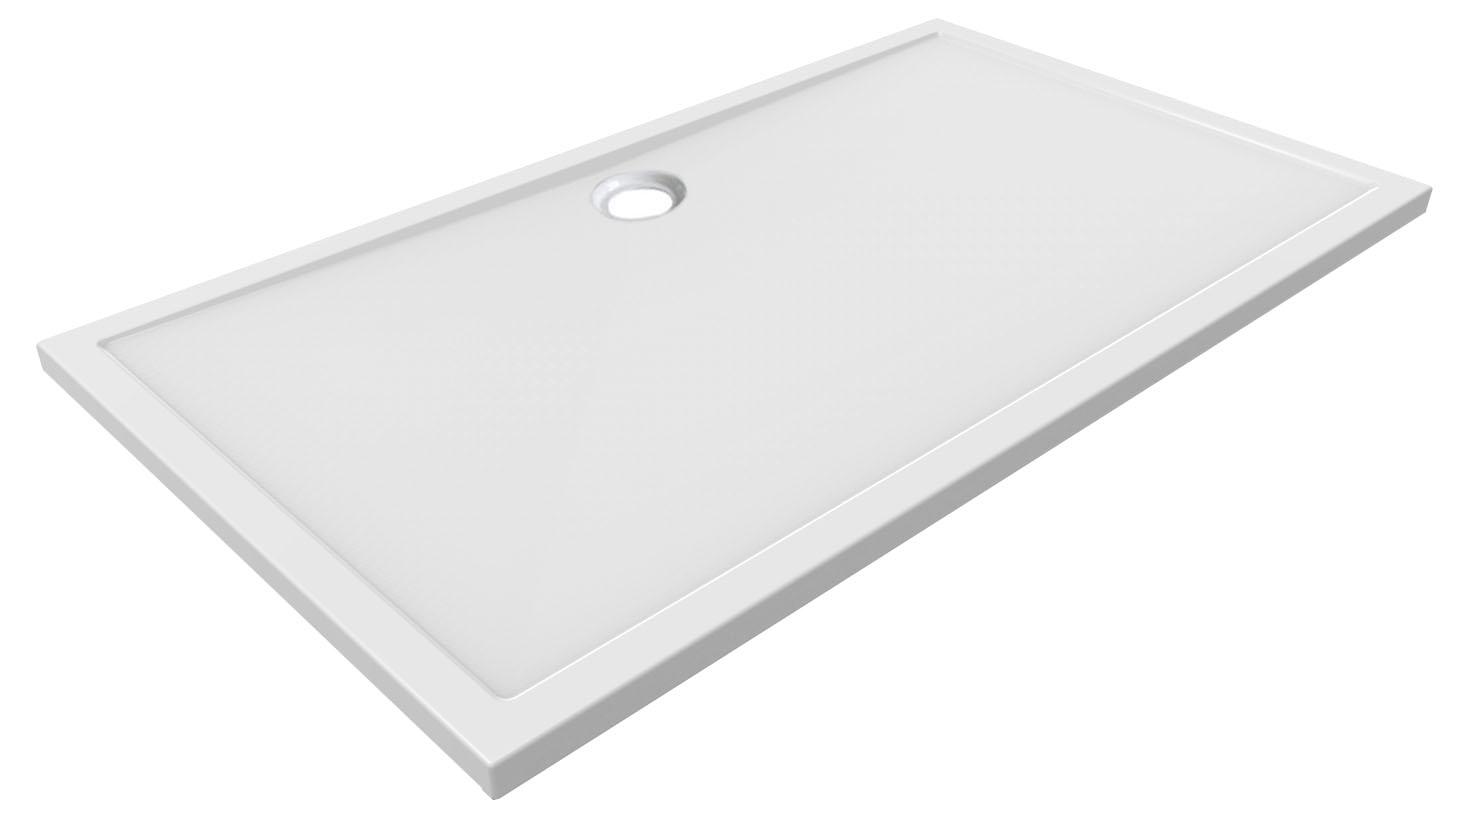 Mueller Luxe douchebak rechthoek 160x90 centimeter acryl wit